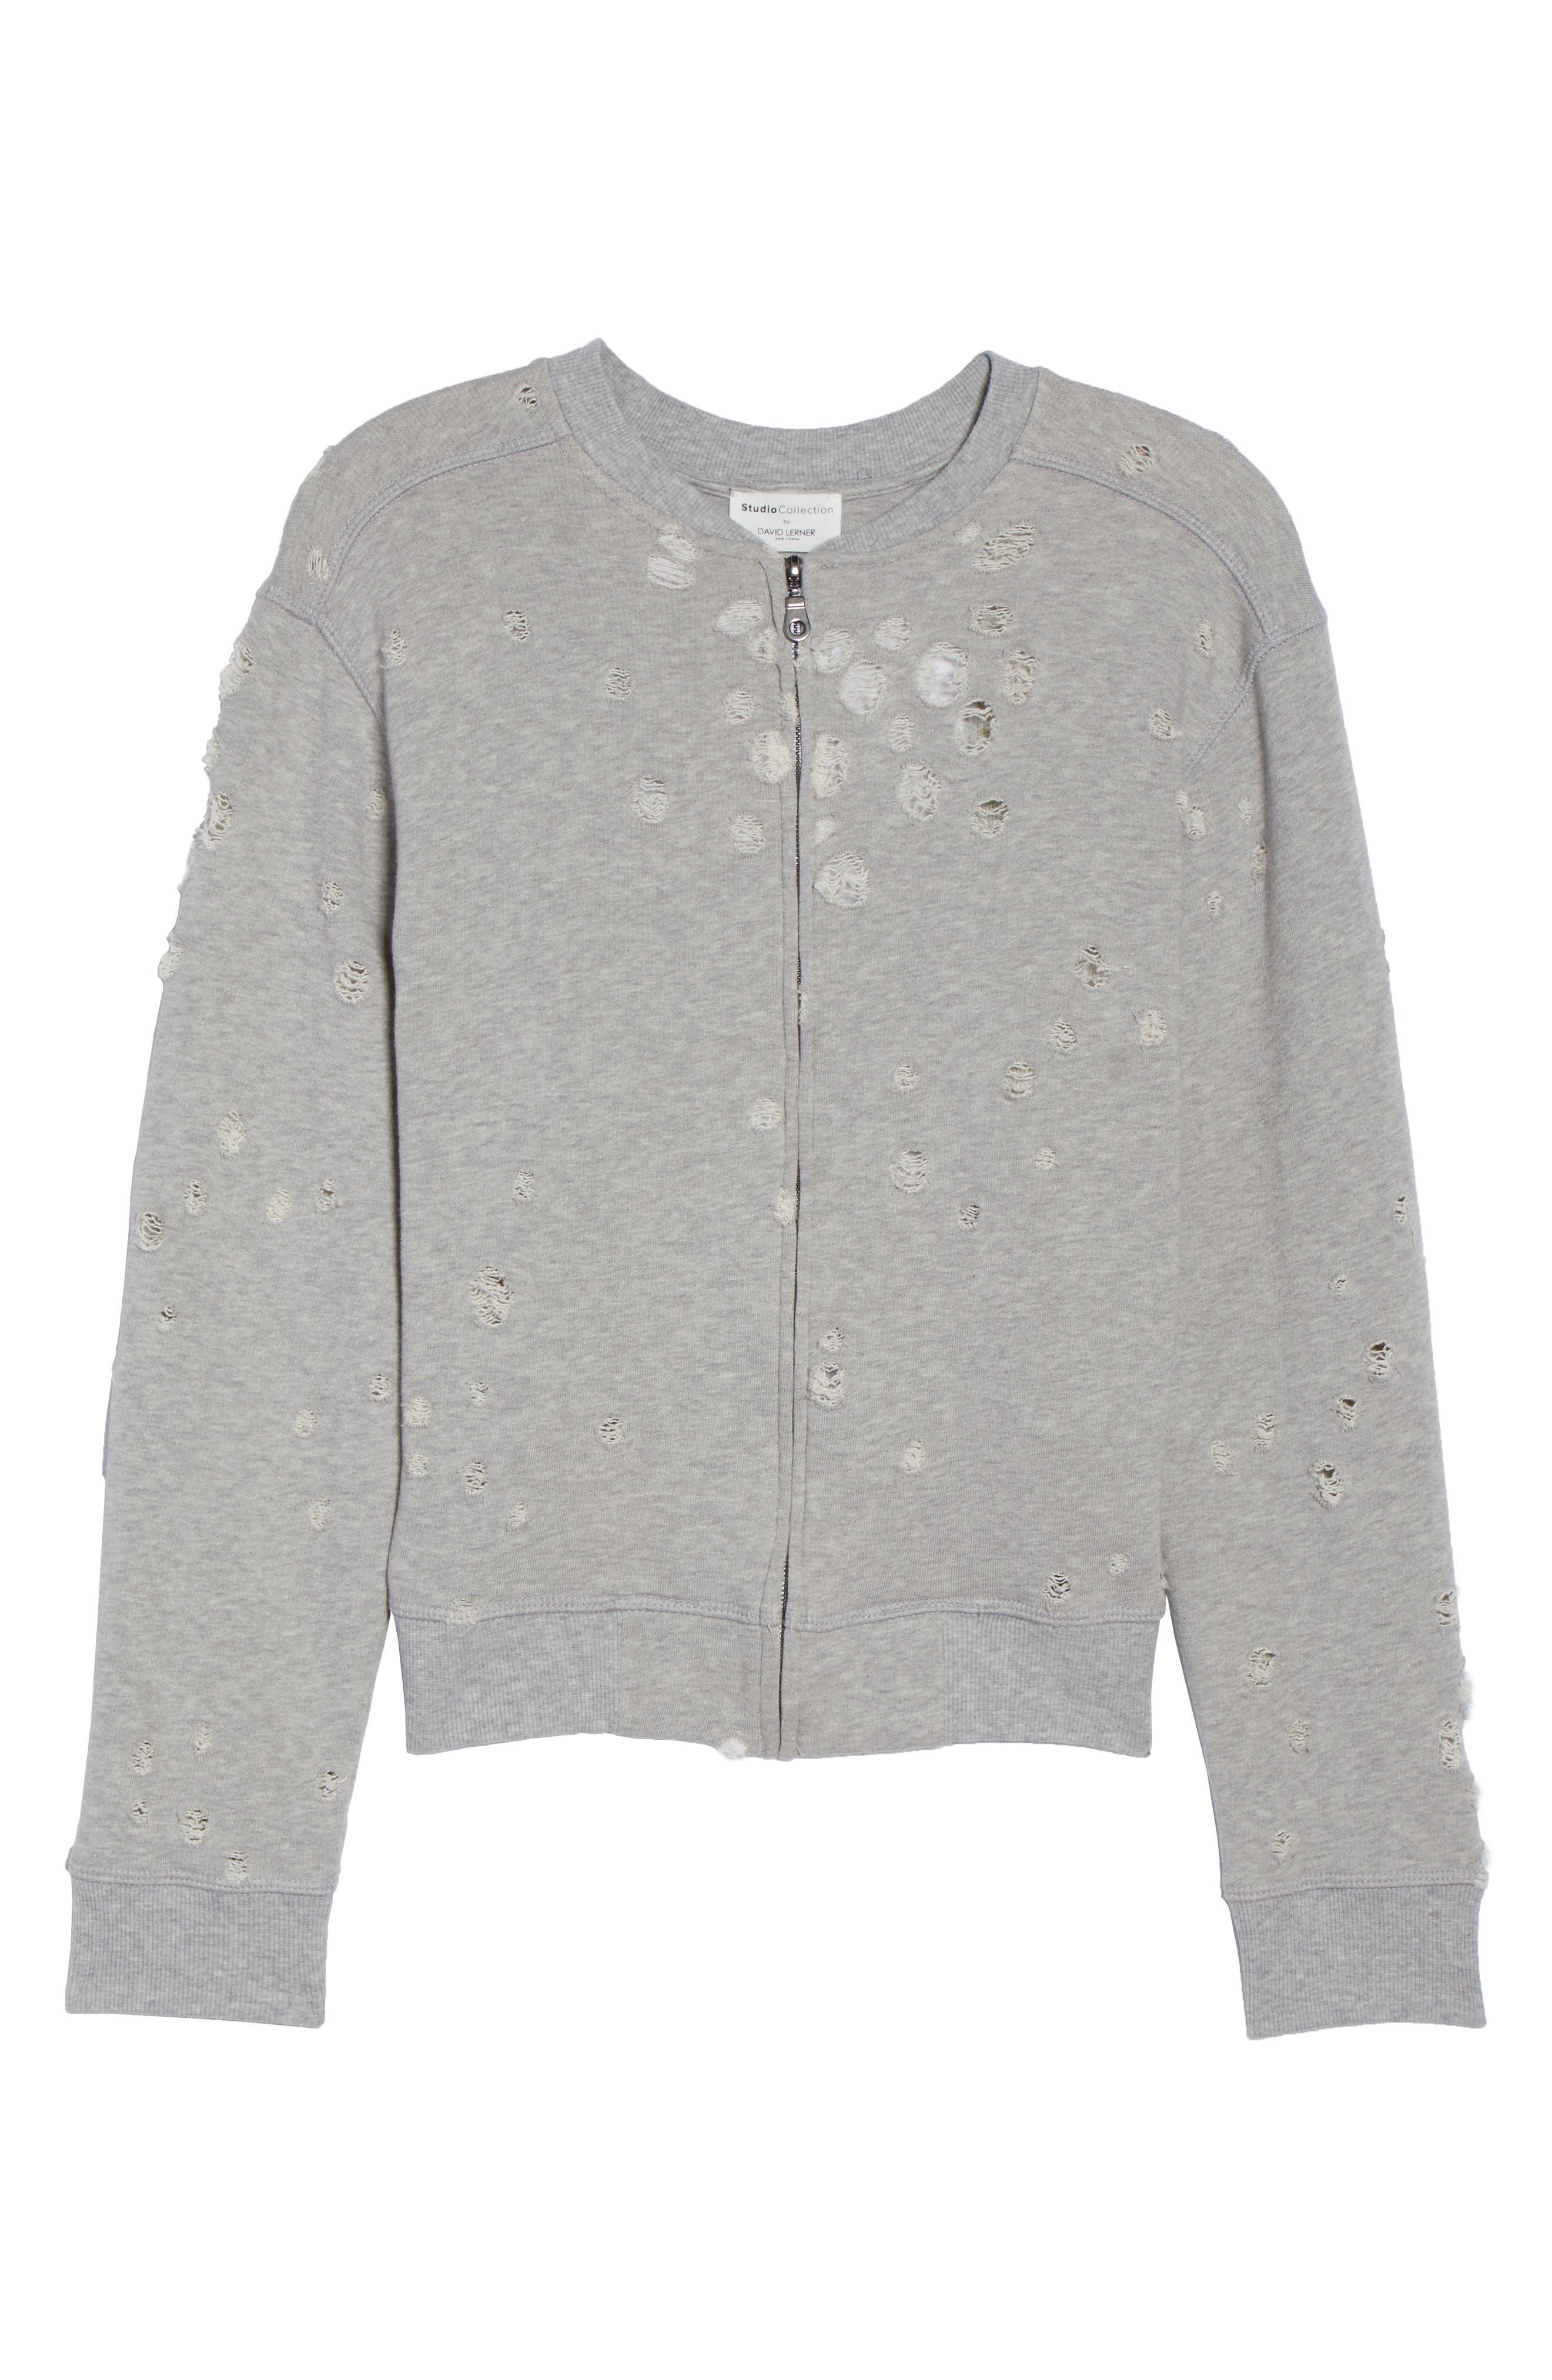 Distressed Zip Sweatshirt,                             Alternate thumbnail 6, color,                             HEATHER GREY